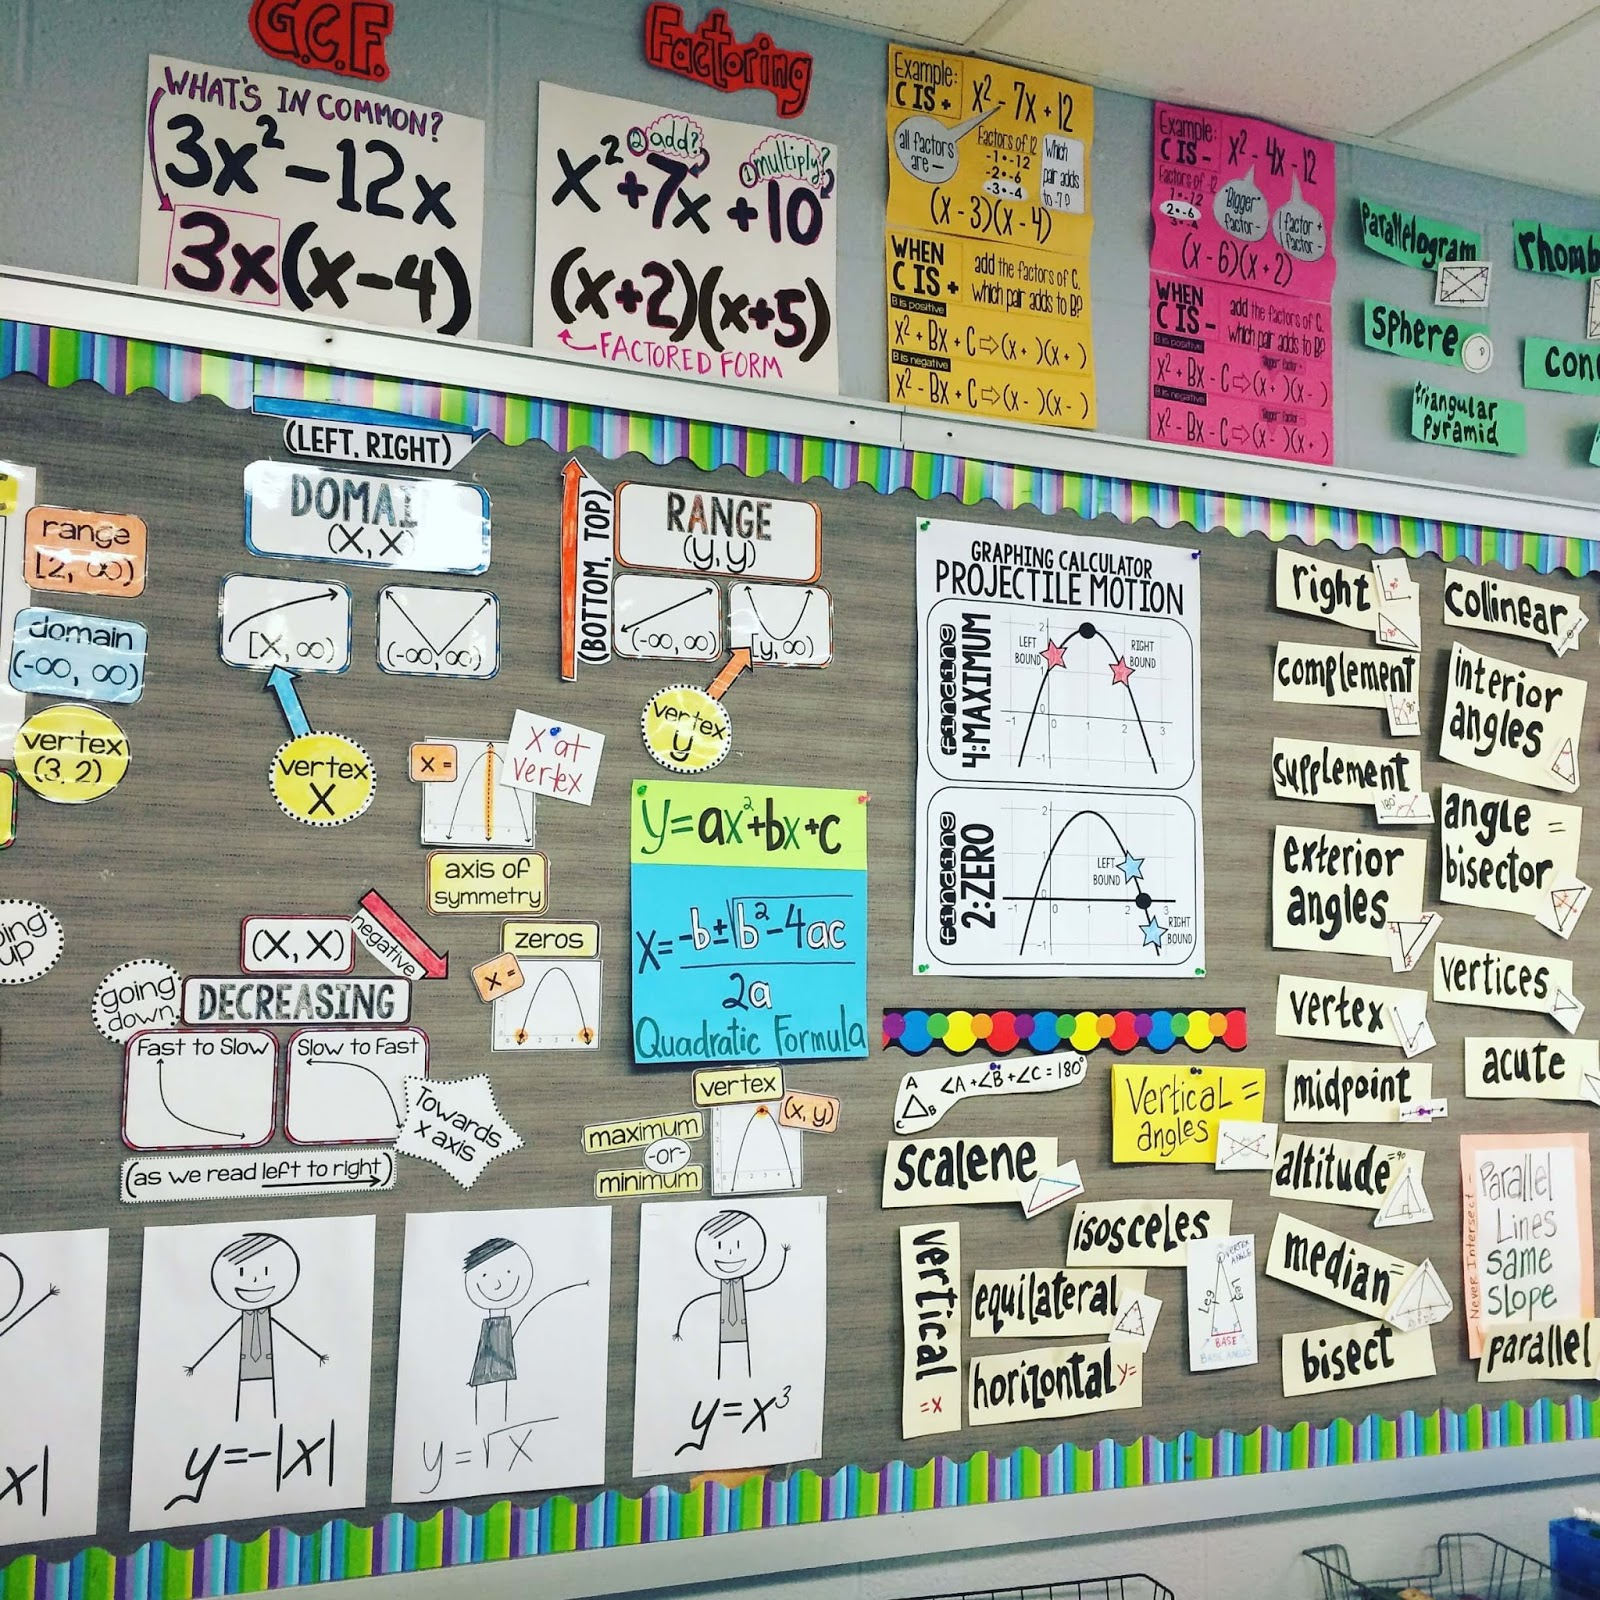 Scaffolded Math And Science High School Math Word Wall Ideas